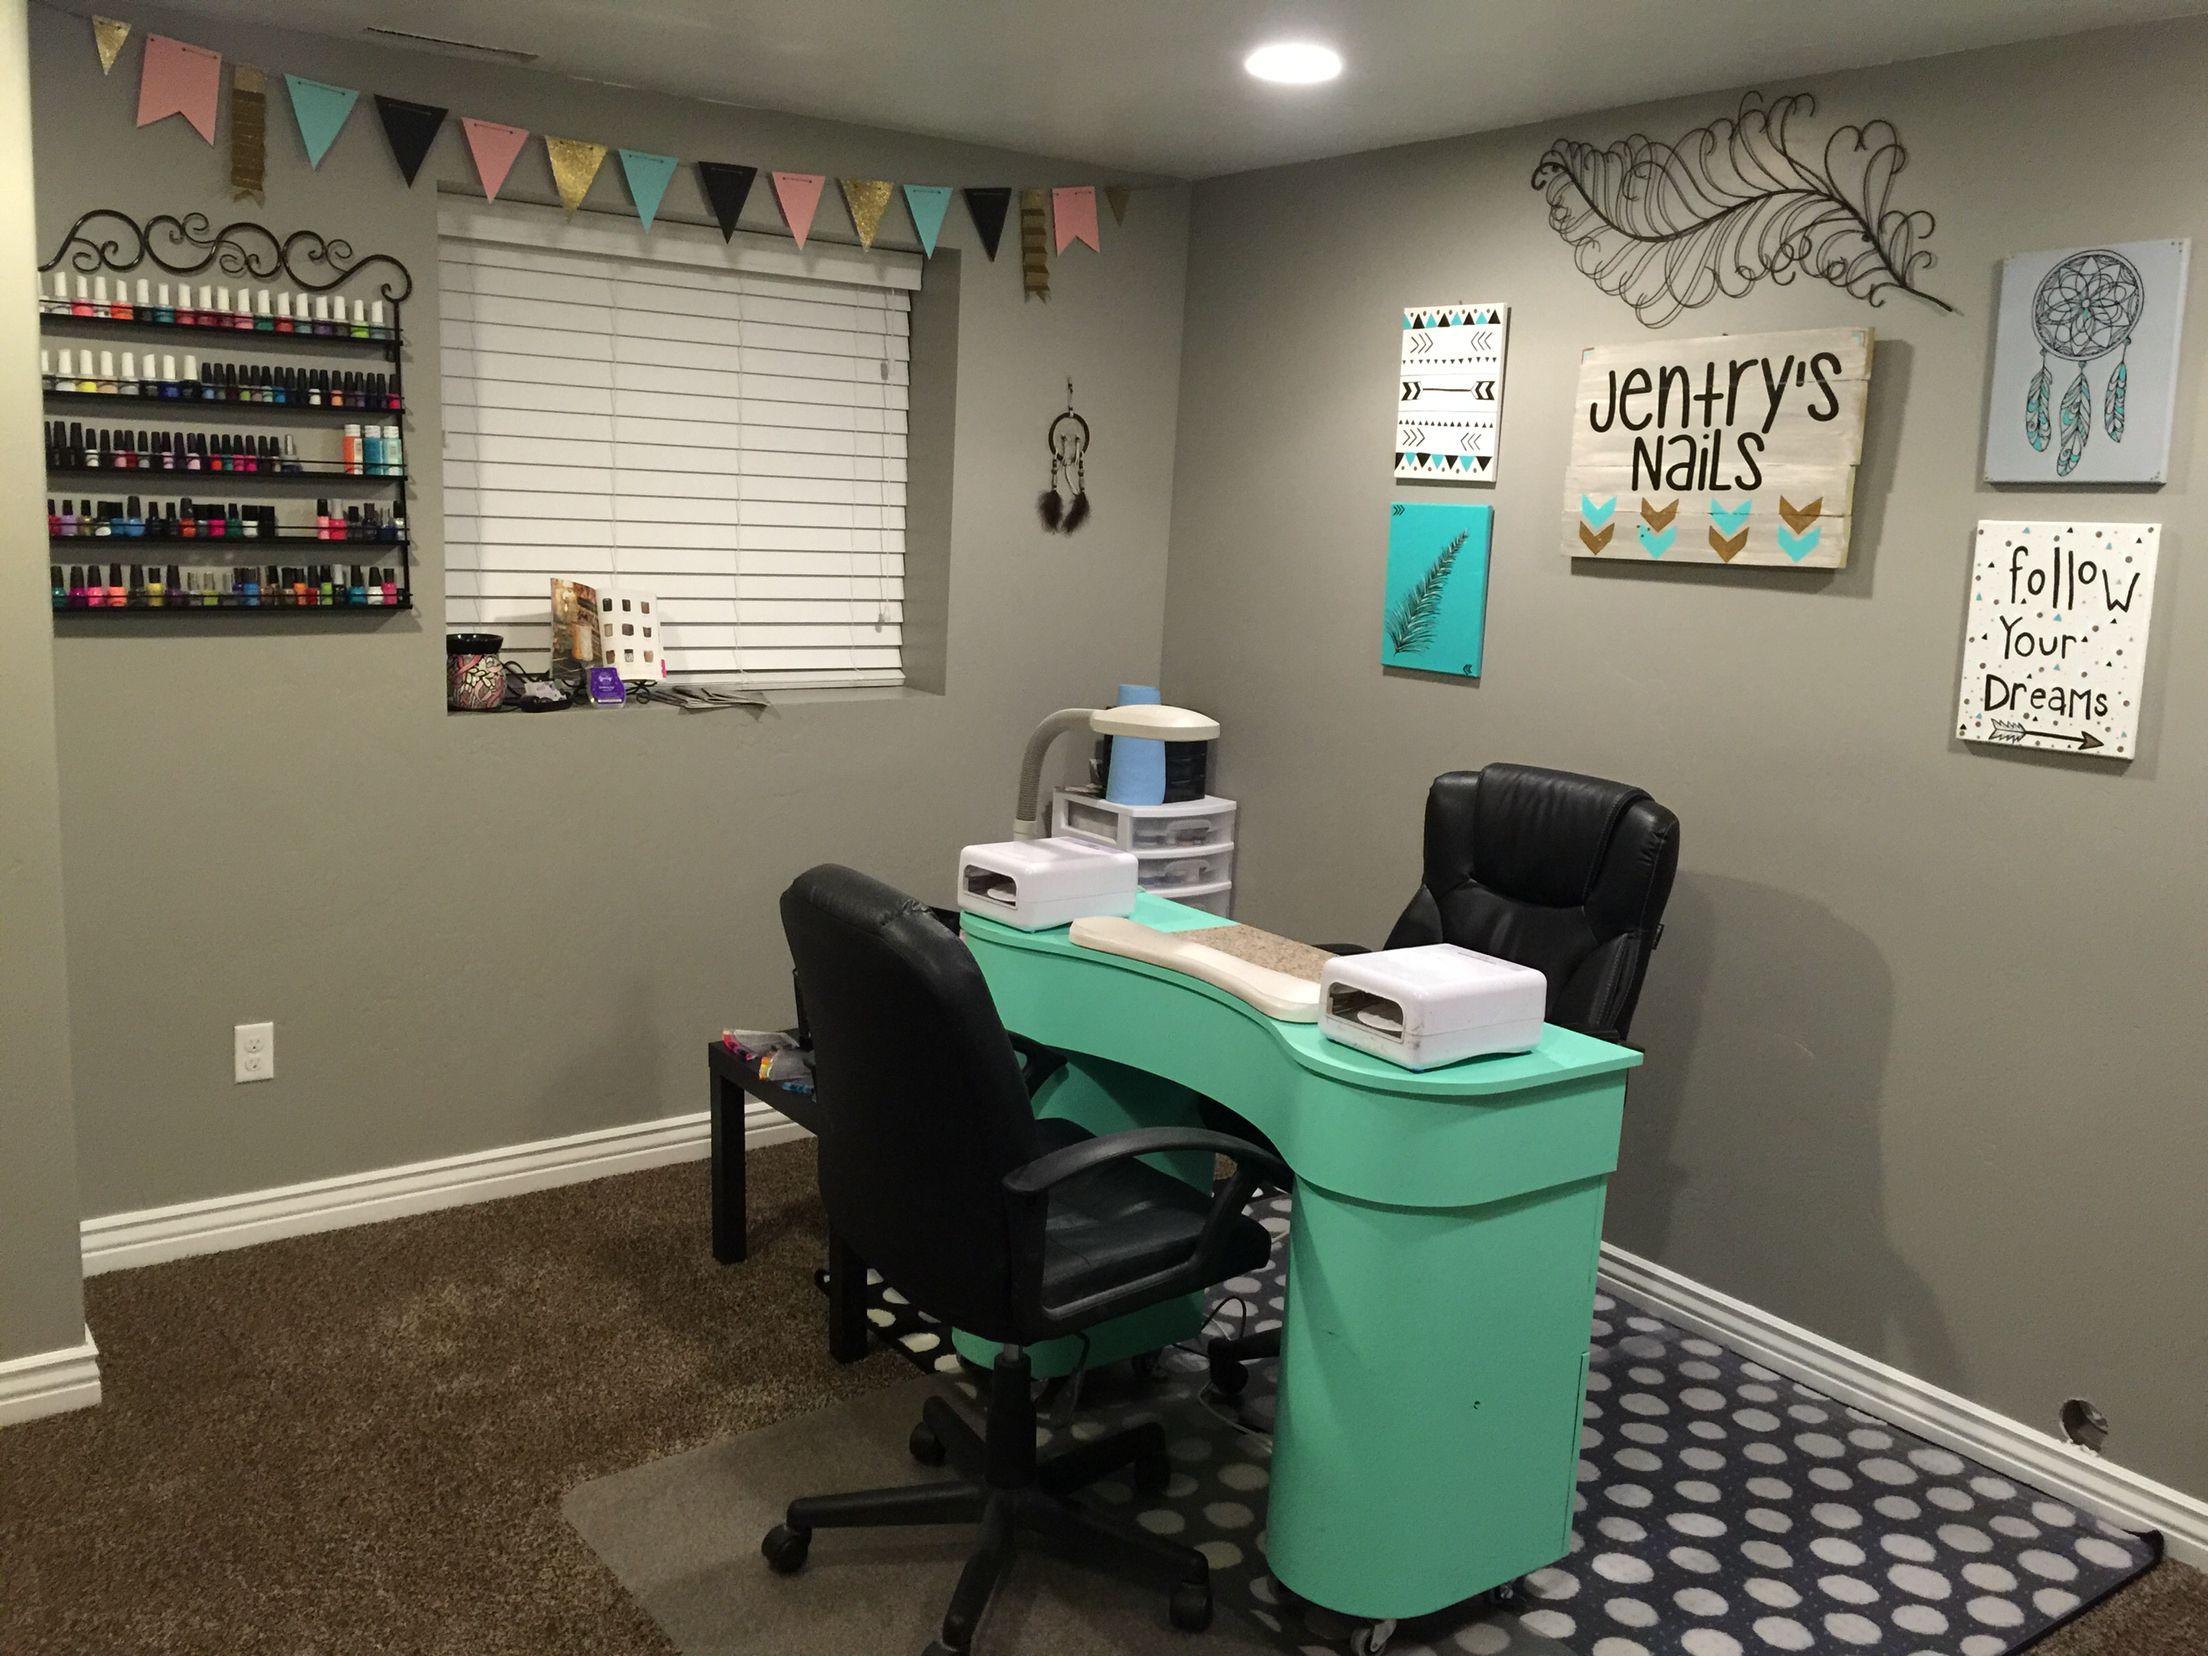 In home nail salon | Crafts | Pinterest | Nail salons ...